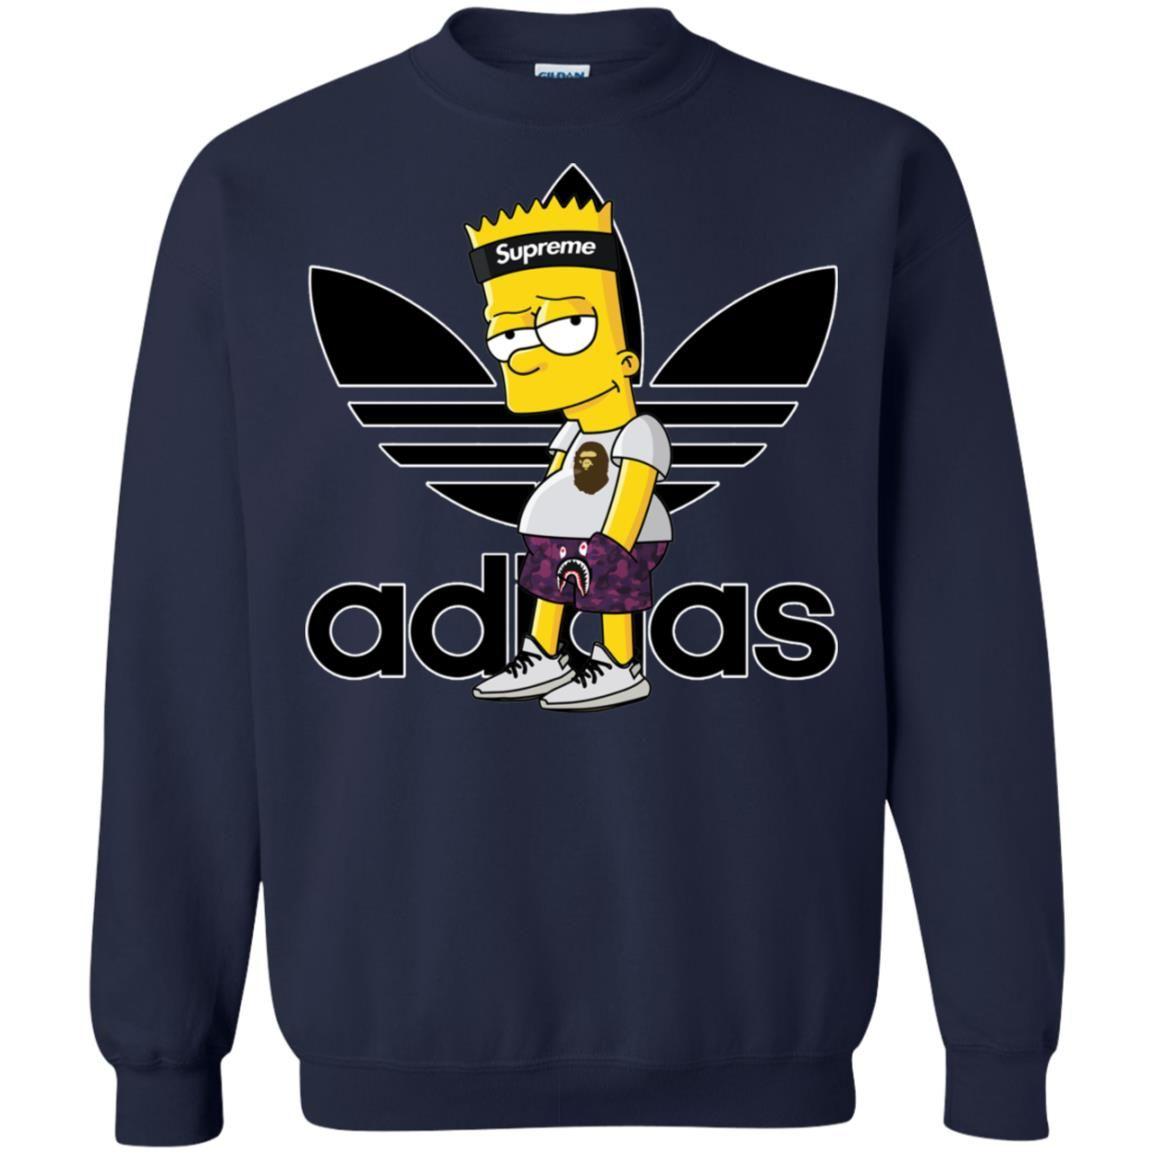 Adidas Bart Simpson Pullover Sweatshirt The Geek Gifts Sweatshirts Pullover Sweatshirt Kids Pullover Hoodie [ 1155 x 1155 Pixel ]